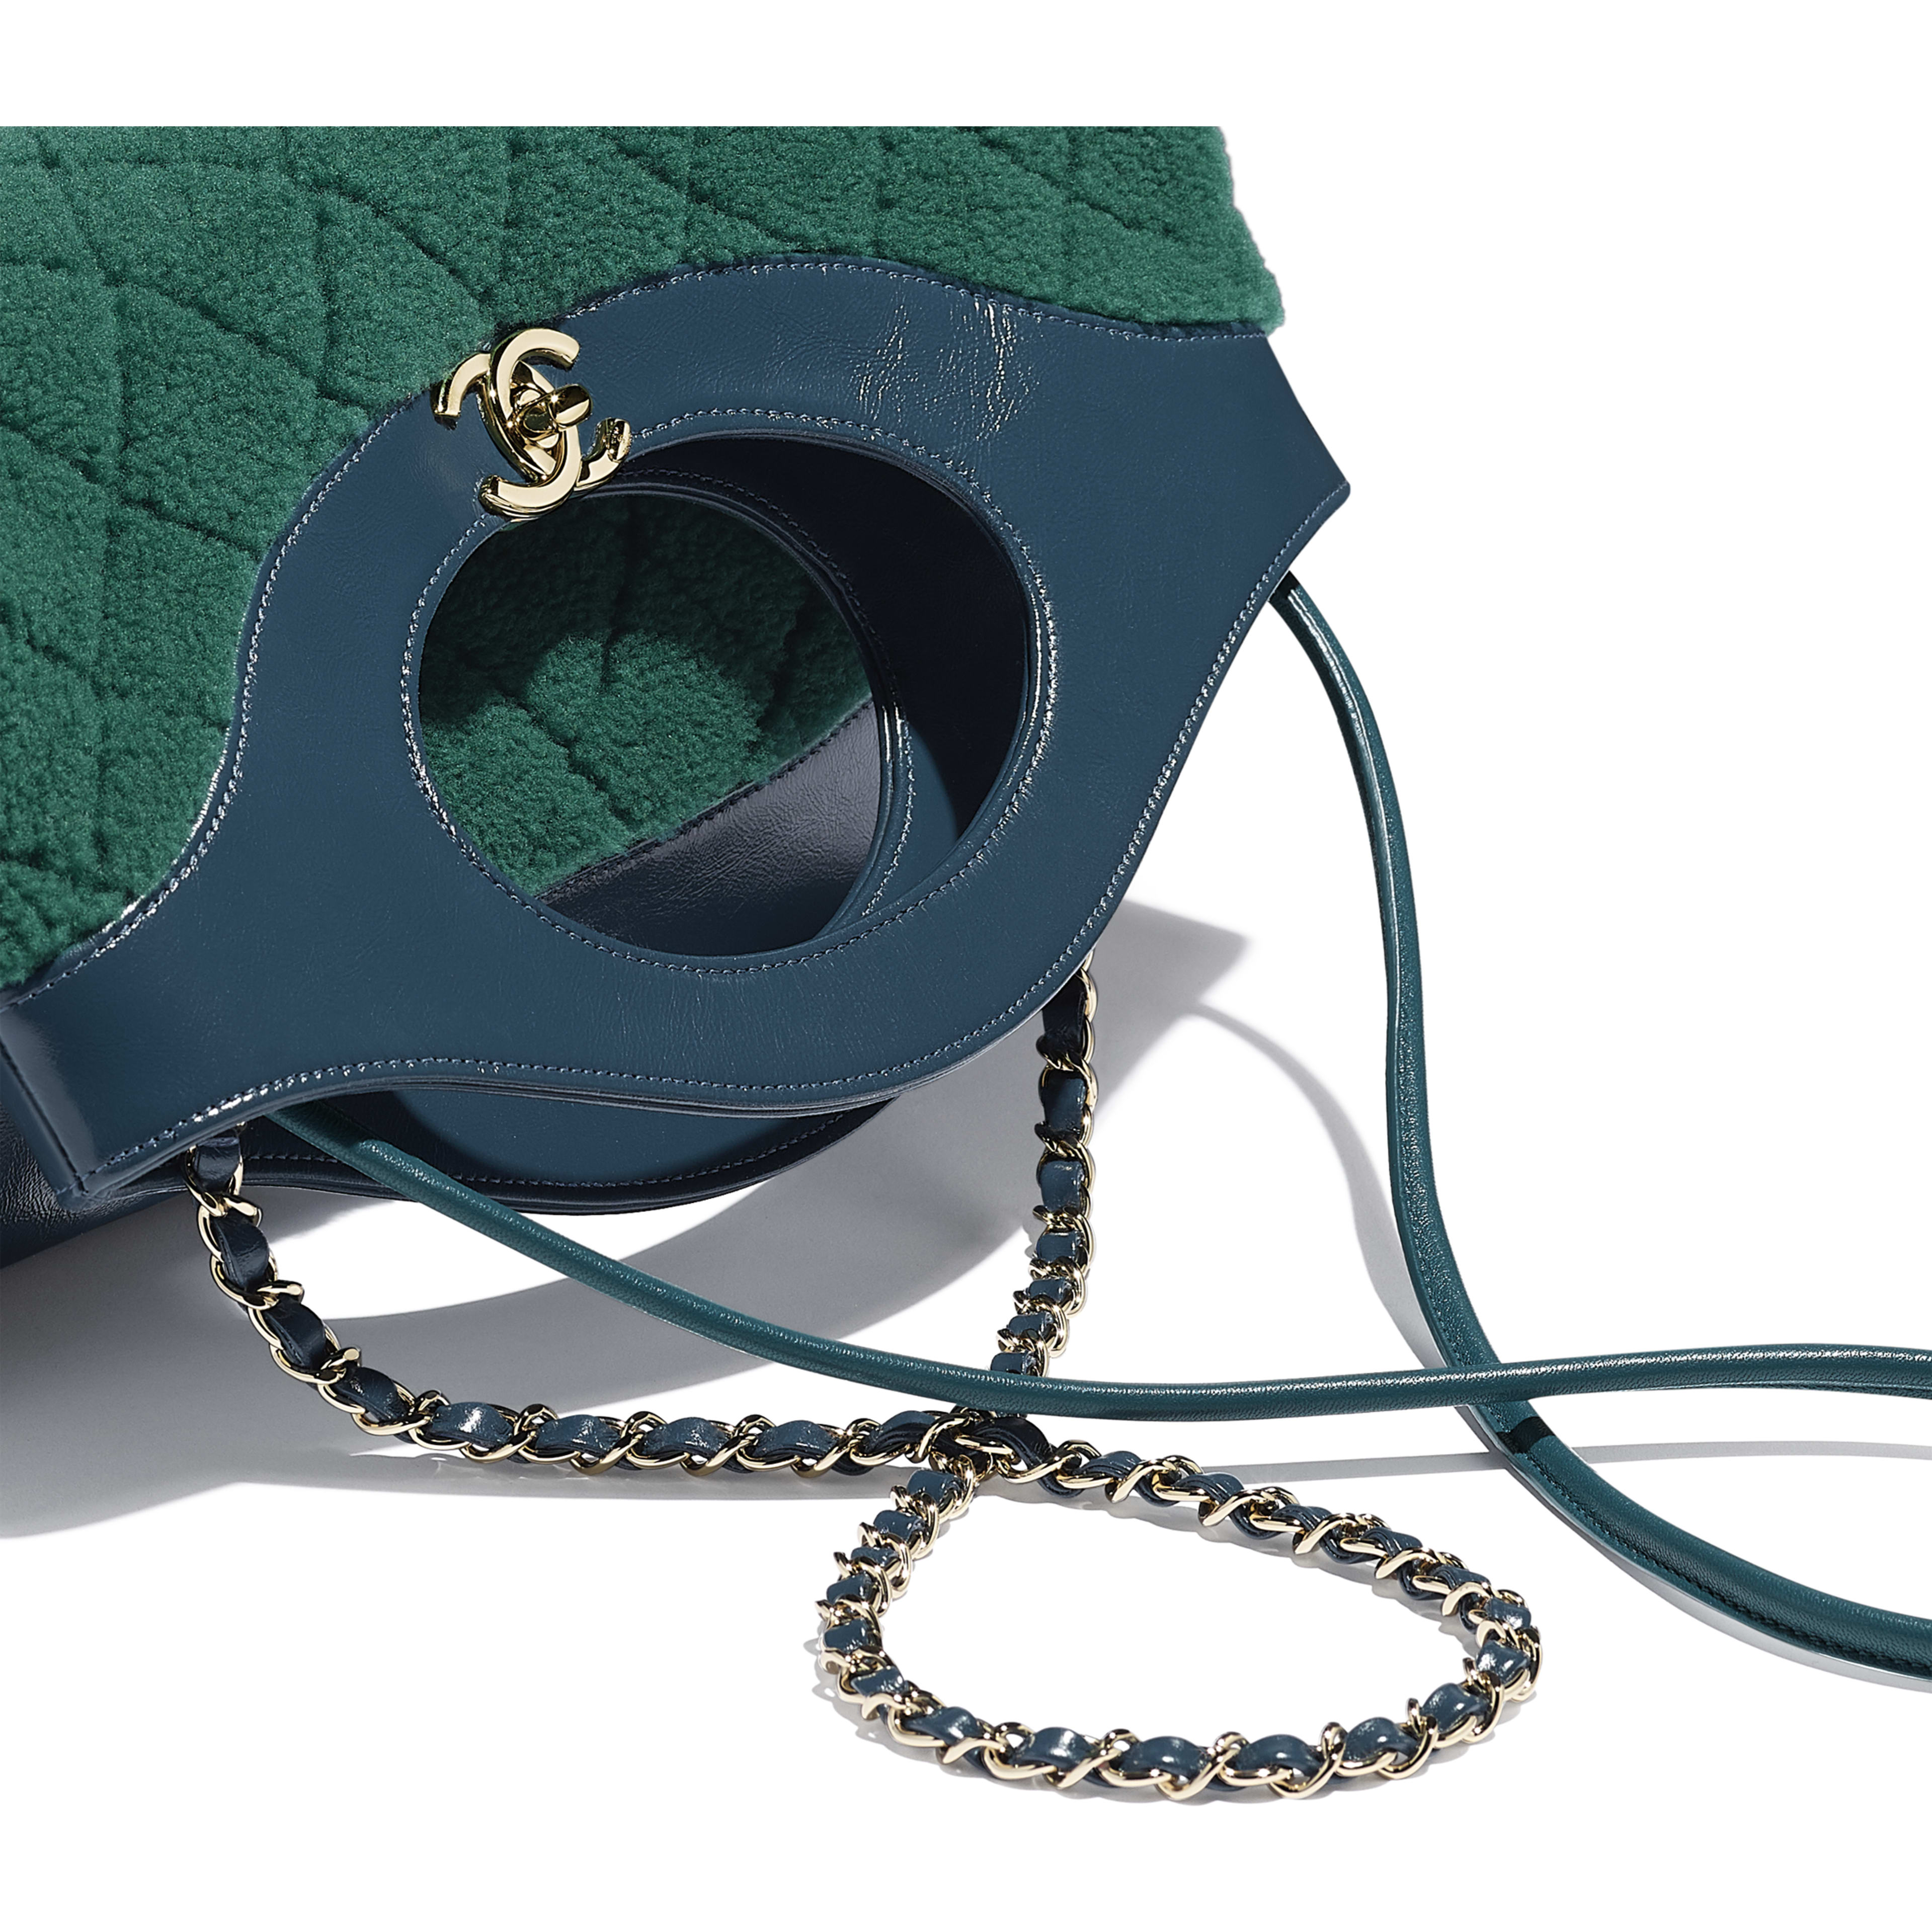 CHANEL 31 Shopping Bag - Green & Blue - Shearling Sheepskin, Calfskin & Gold-Tone Metal - Extra view - see full sized version